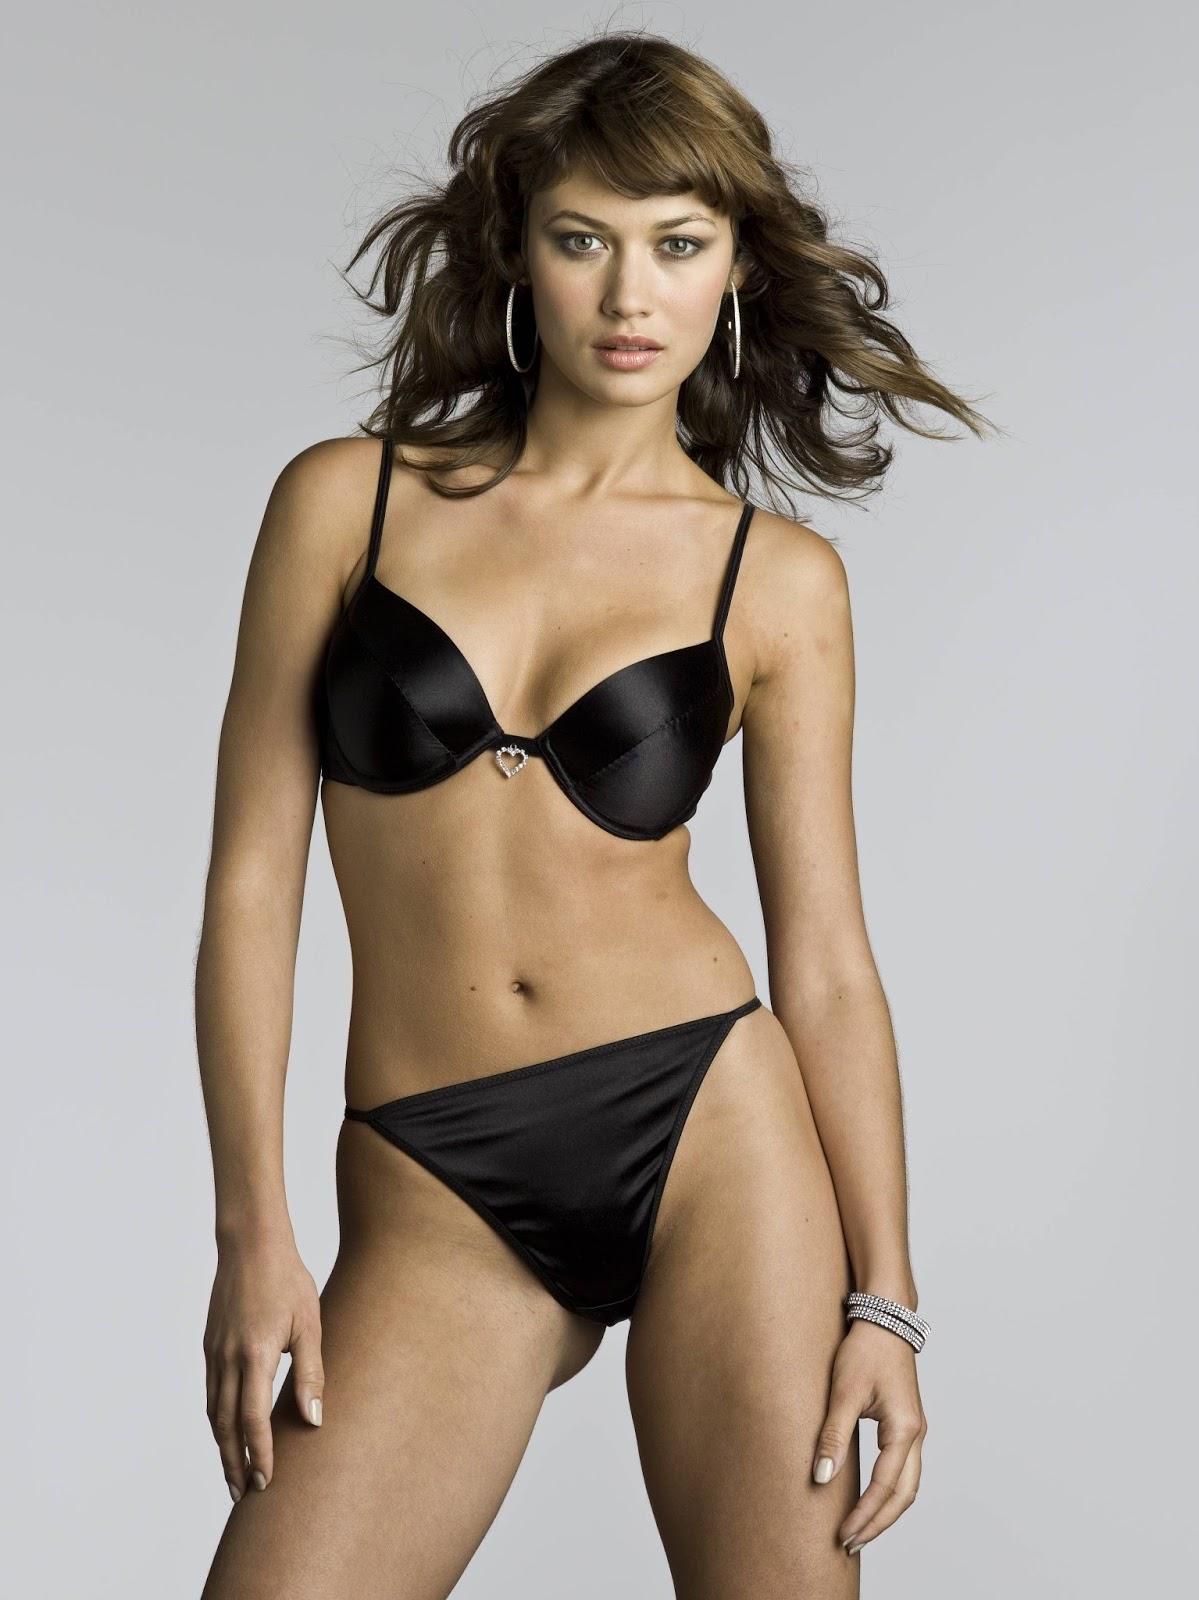 Olga Kurylenko Bikini 93